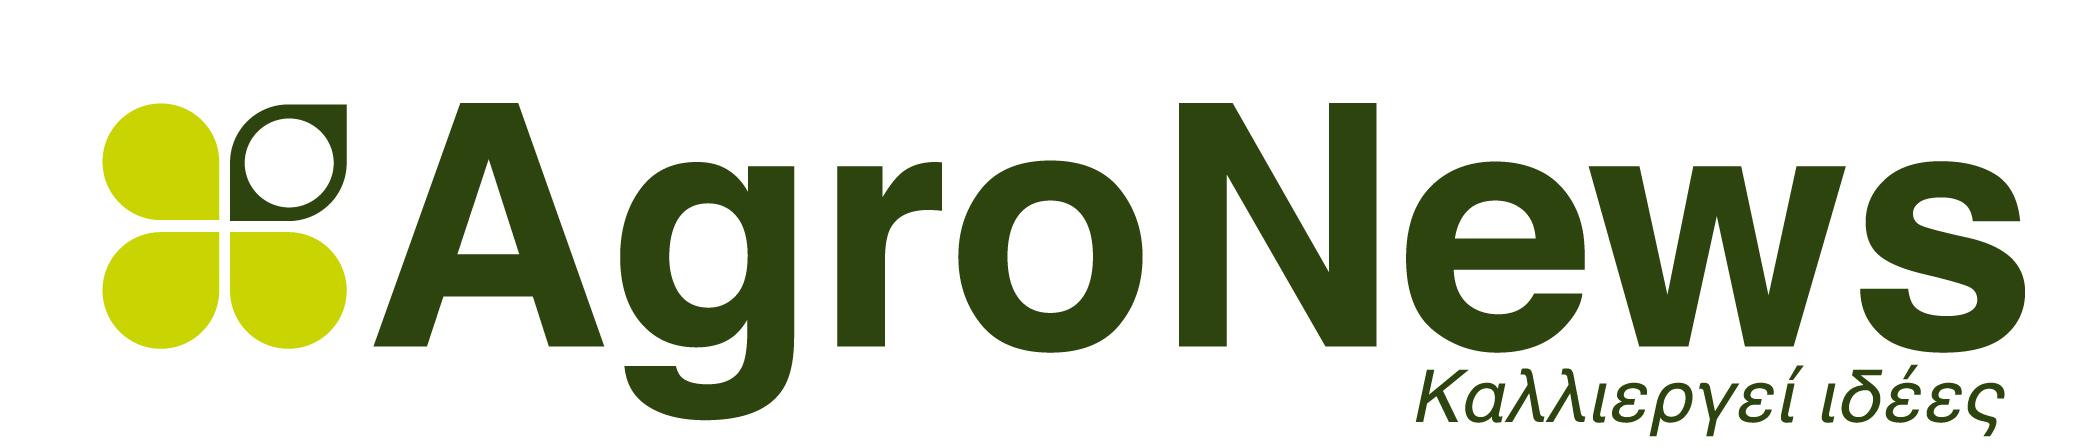 logo_agronews.jpg